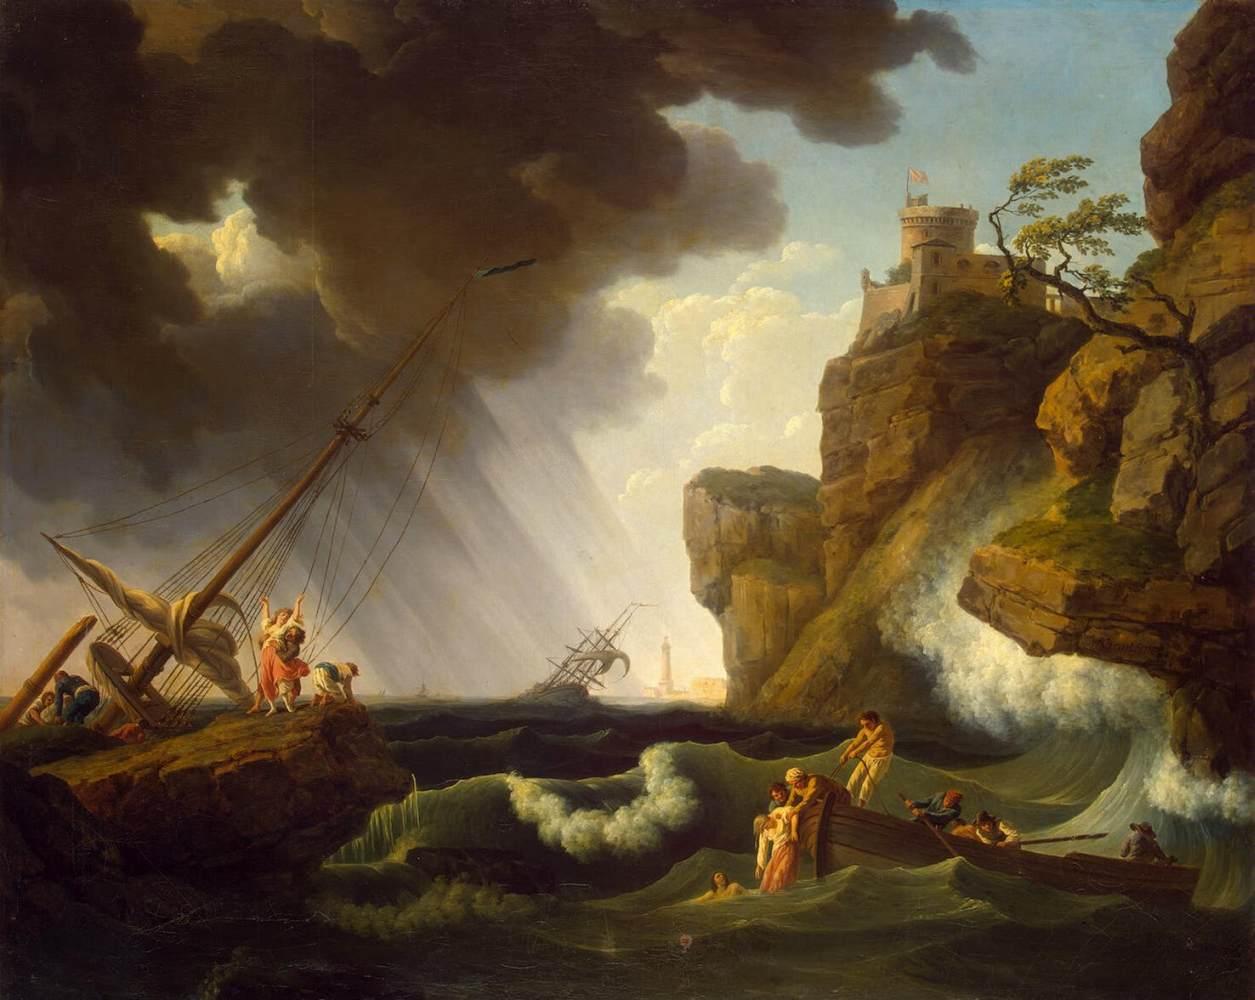 Shipwreck / by CLAUDE-JOSEPH VERNET